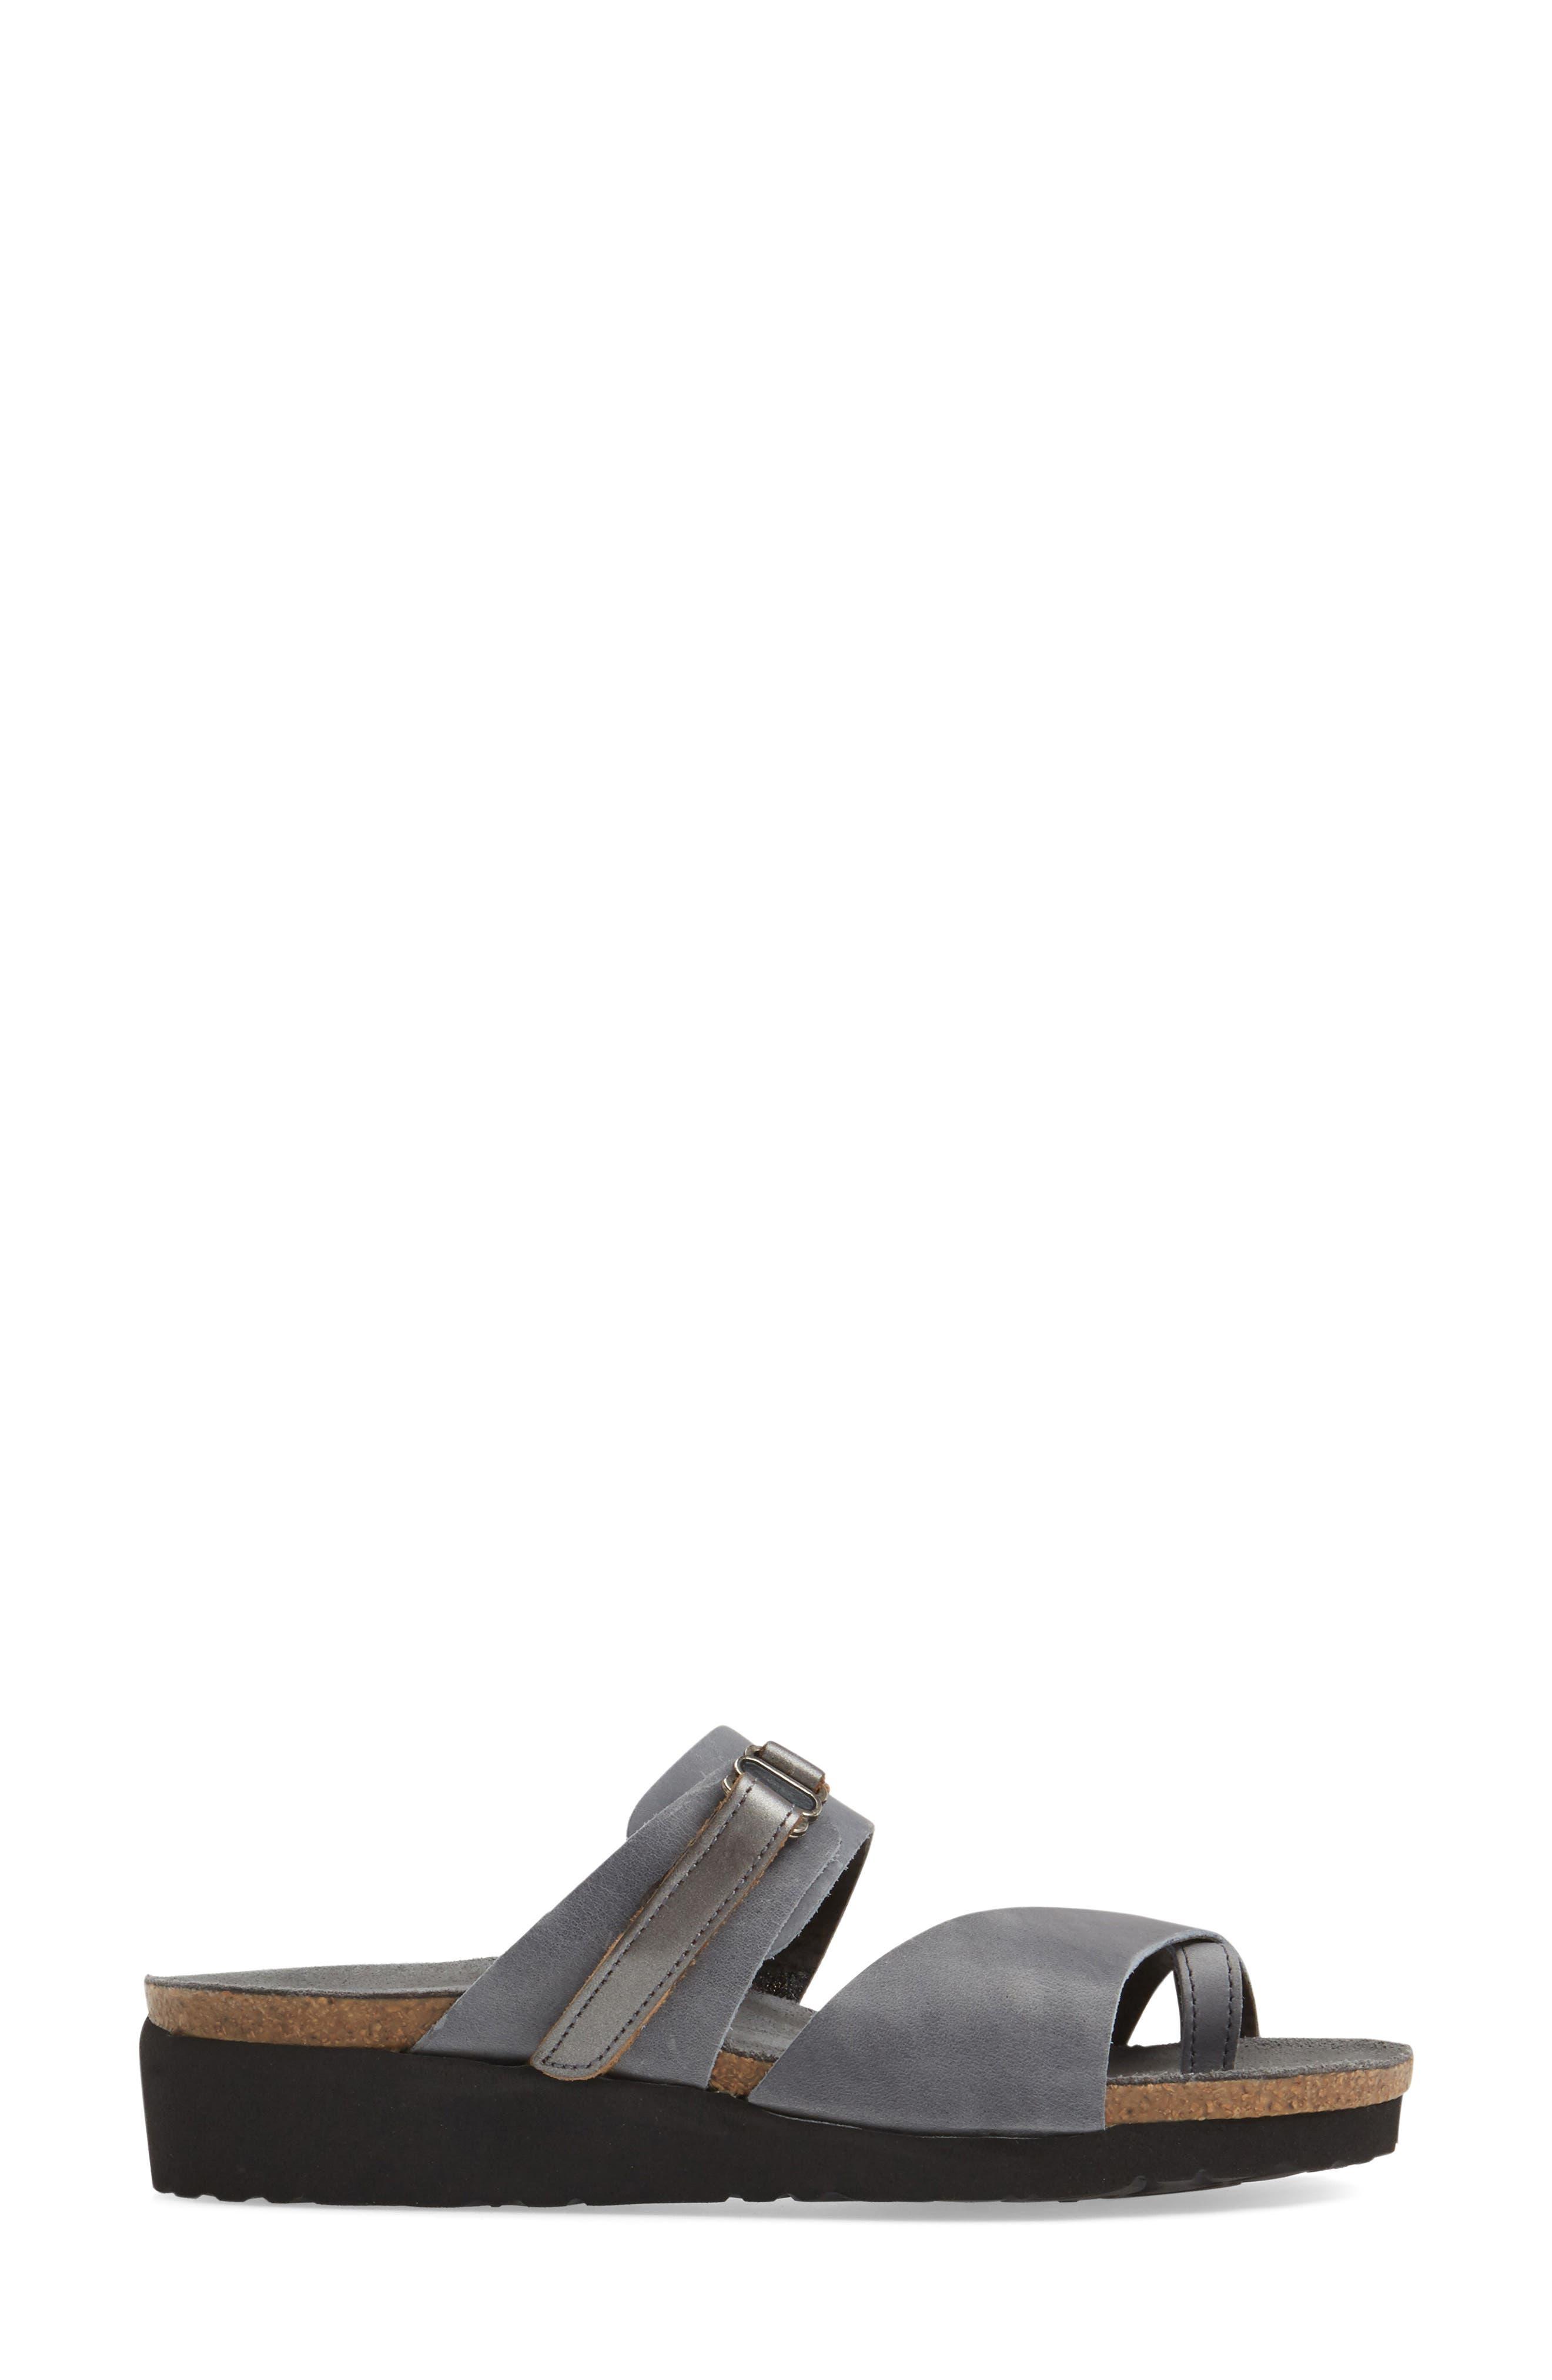 Jessica Sandal,                             Alternate thumbnail 3, color,                             Vintage Slate Leather